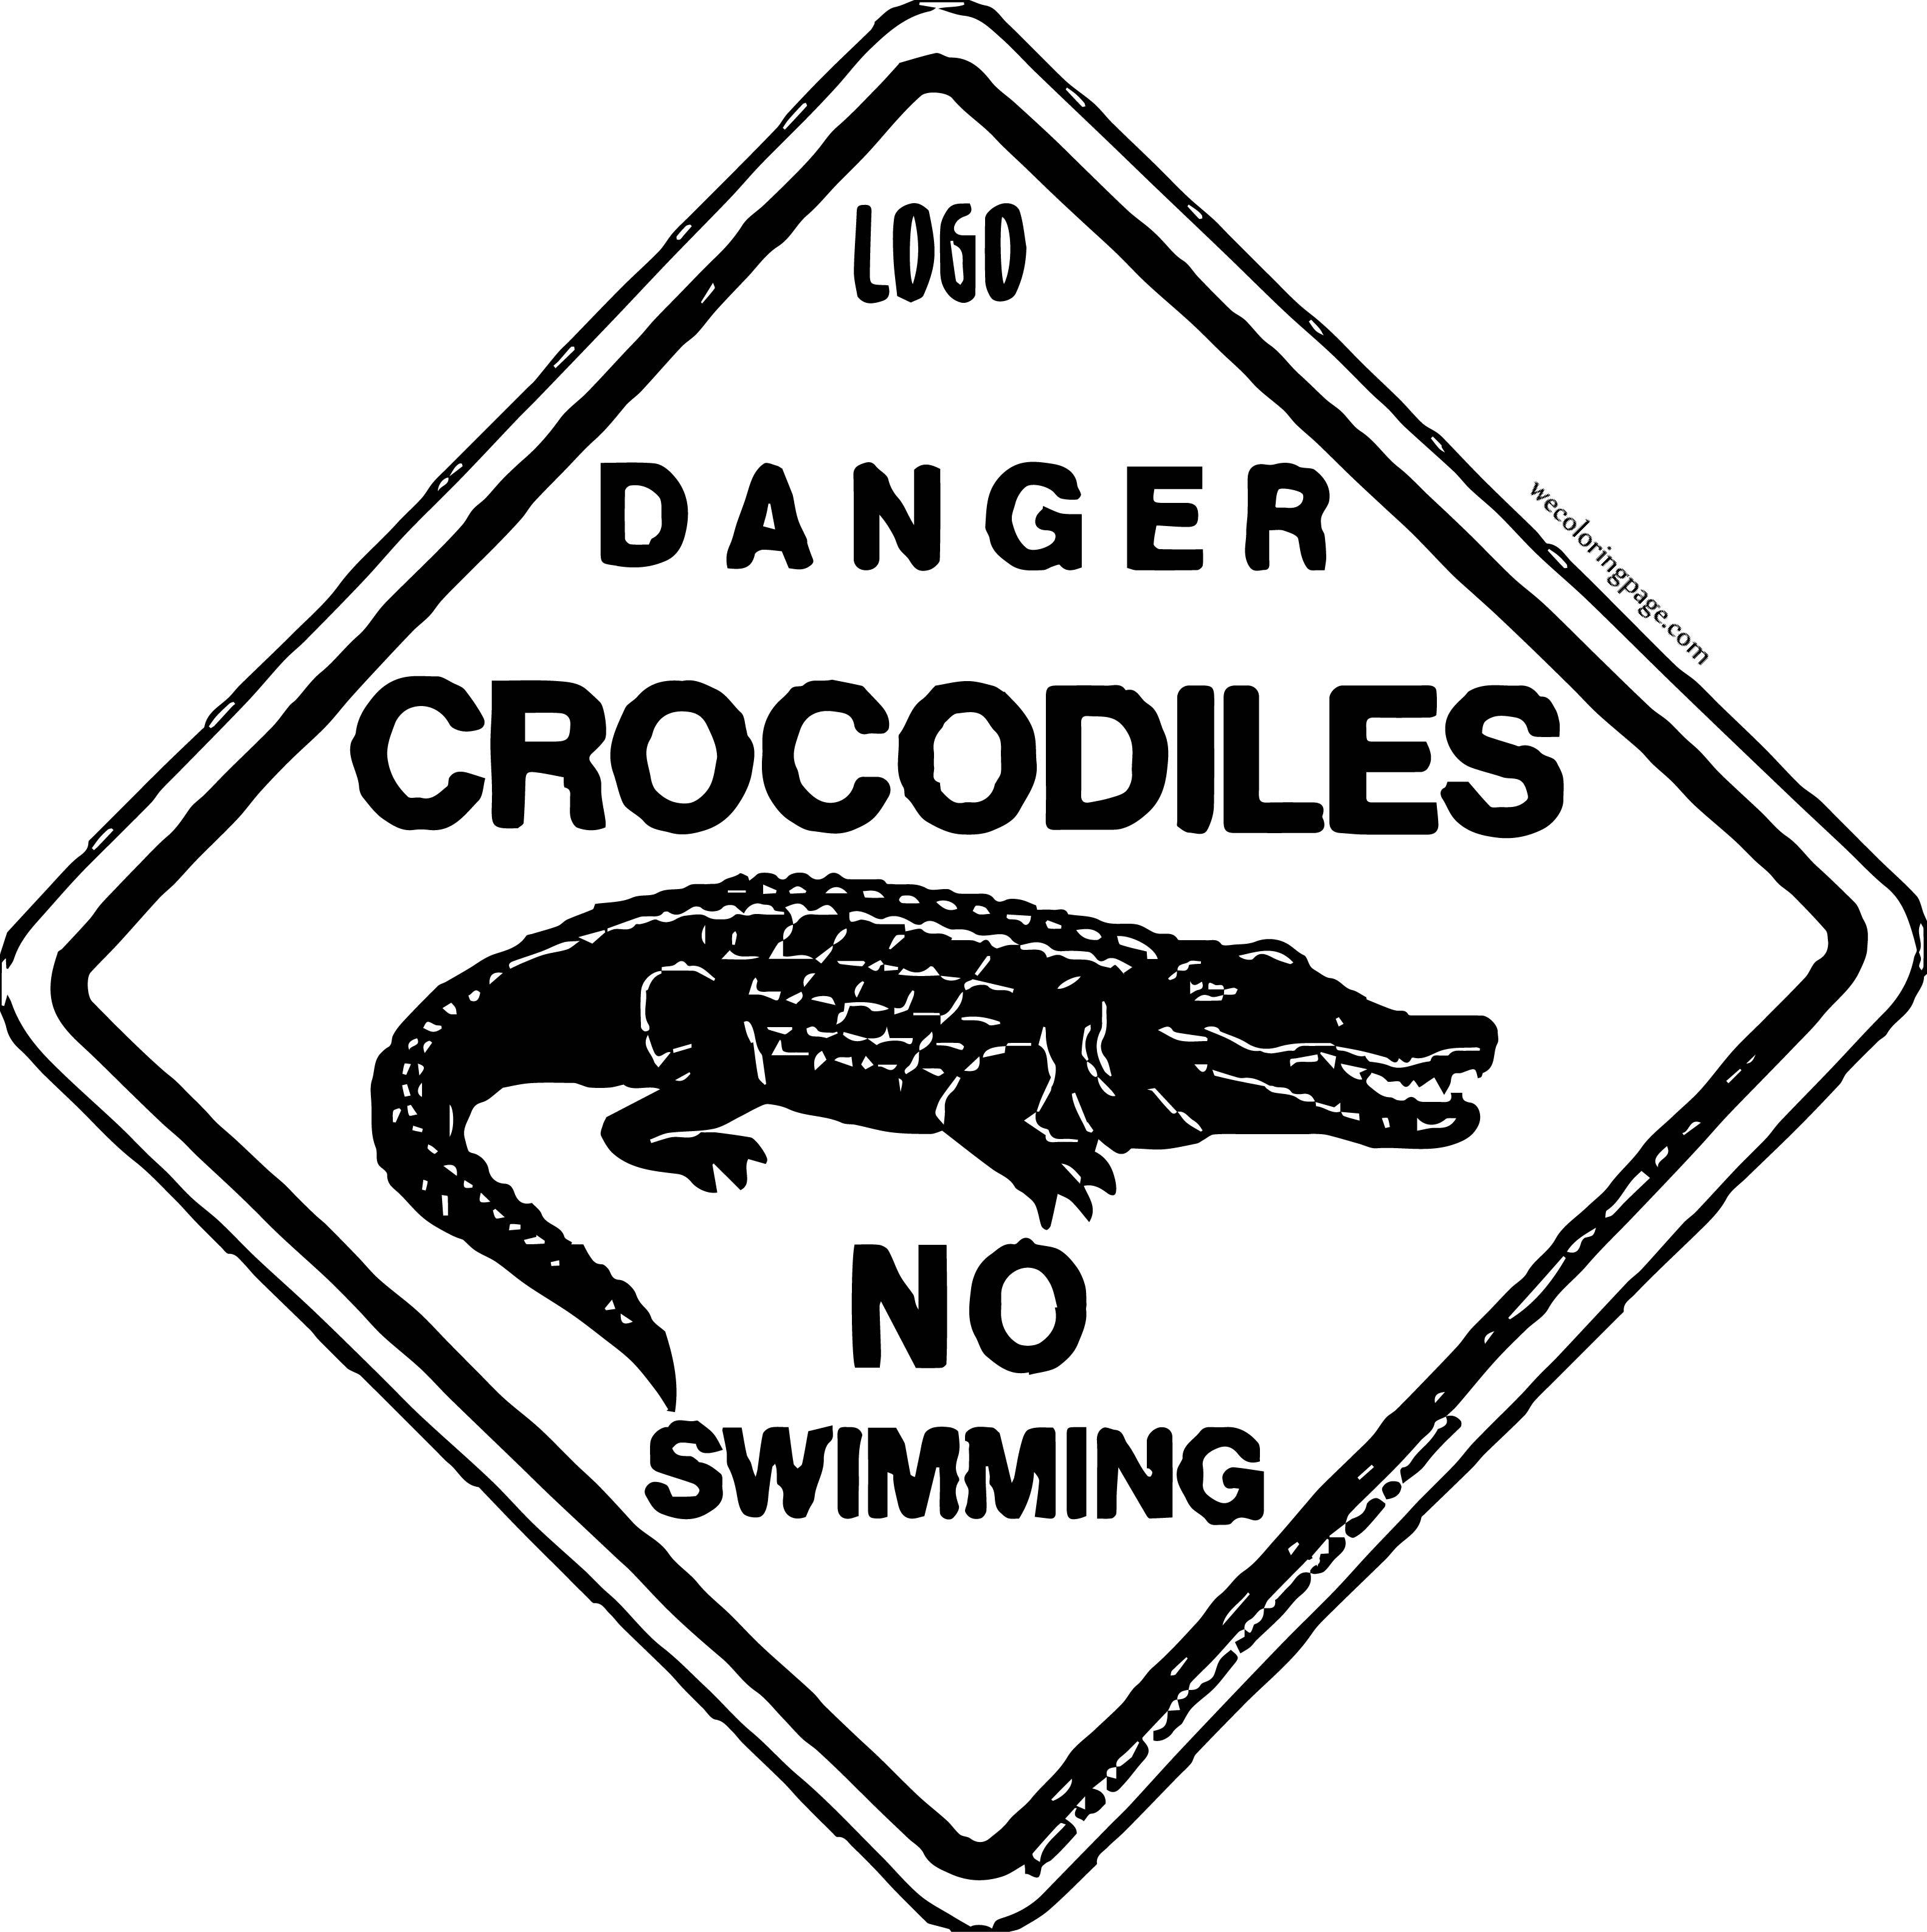 Danger Crocodile Alligator Sign Coloring Page